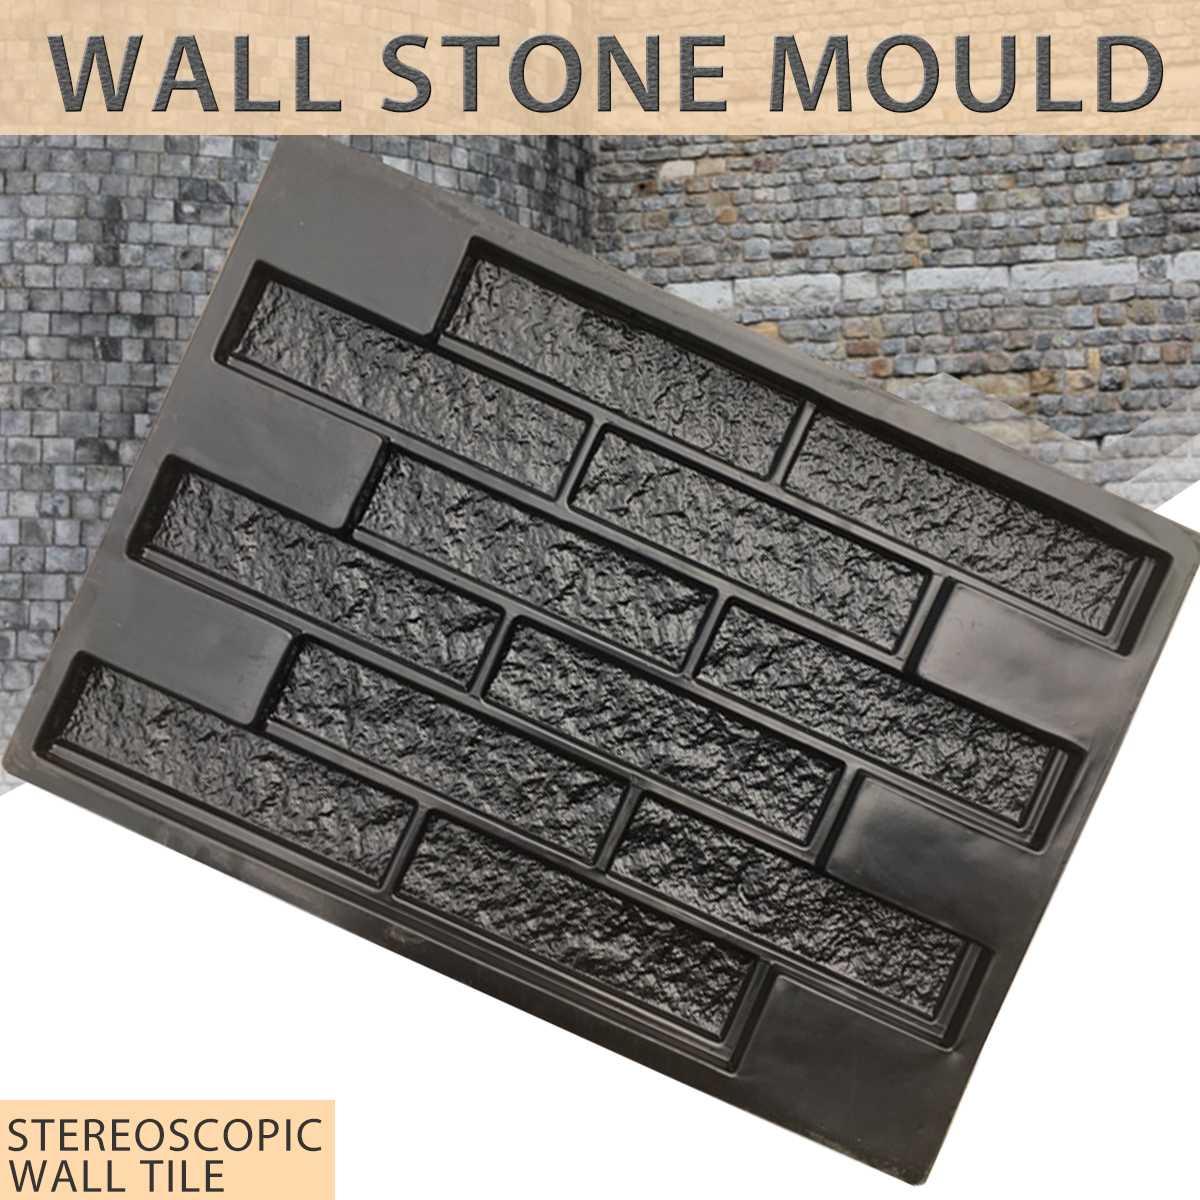 Plastic Molds Wall Concrete Plaster Garden House Wall Stone Tiles Stone Mold Cement Bricks Maker Mould 69*49cm Decorative